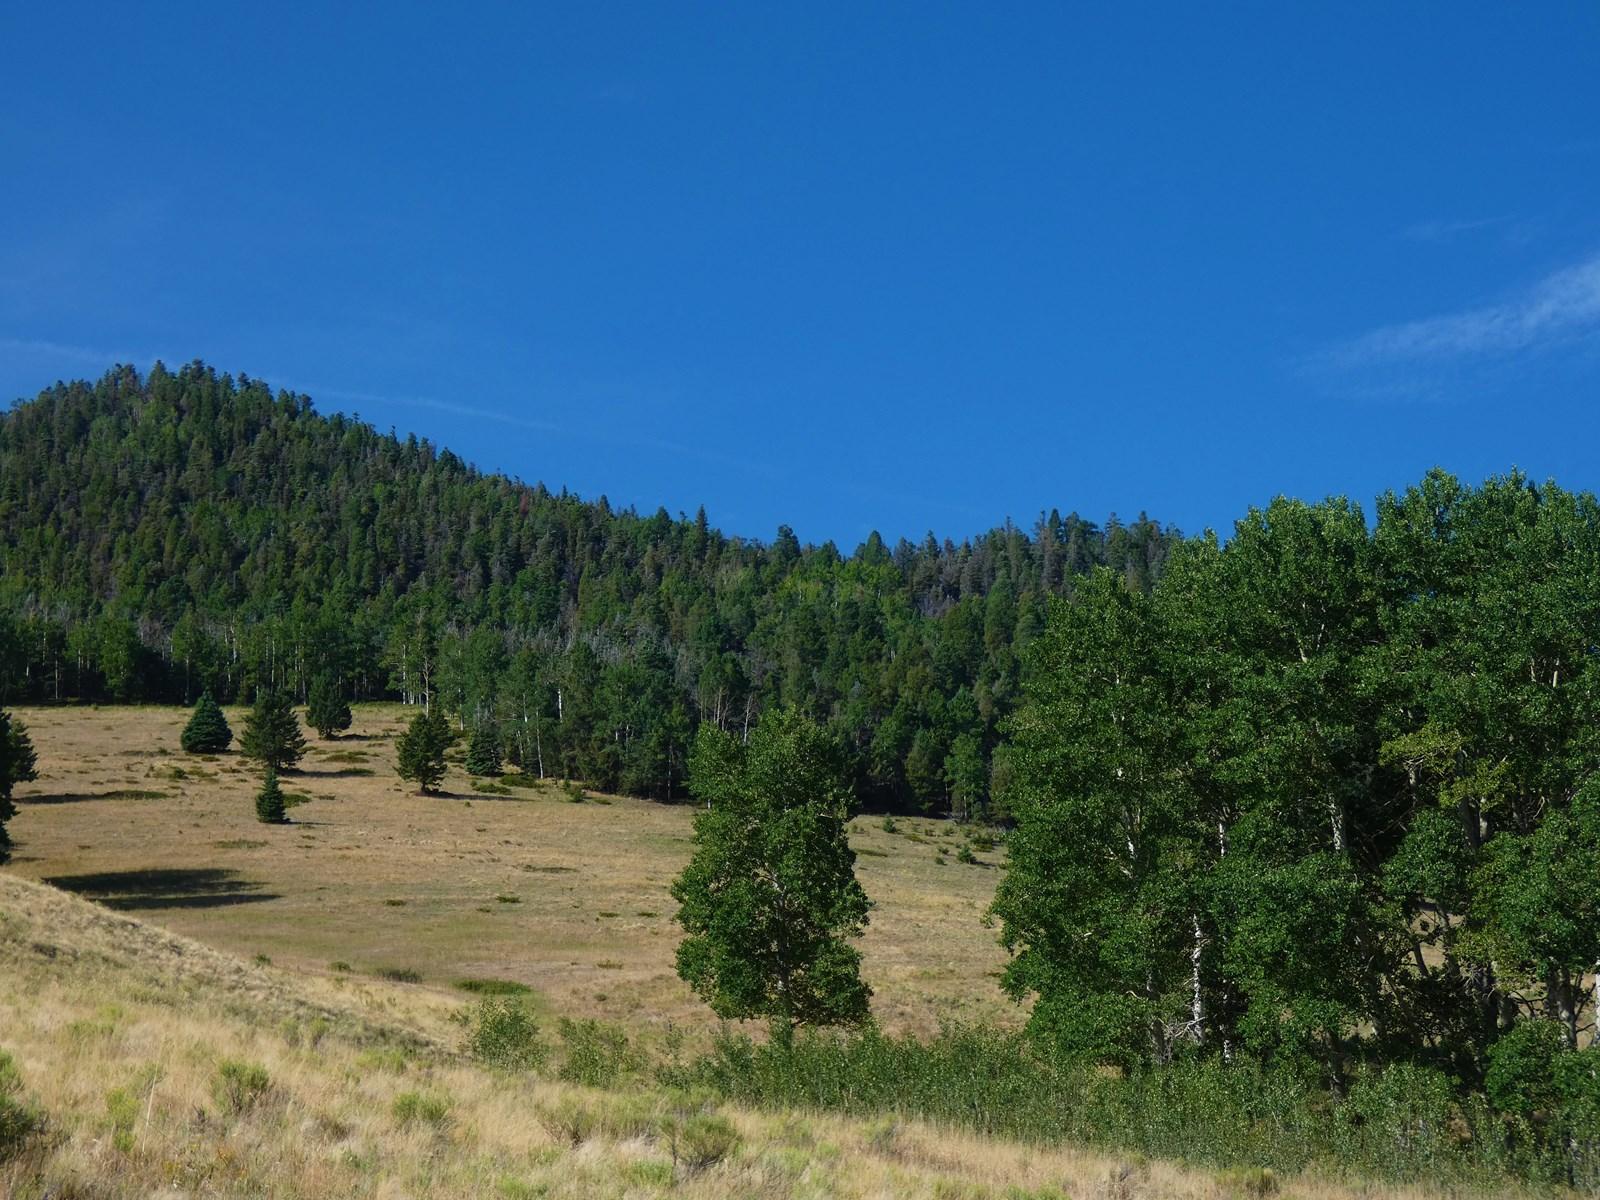 Aspen Groves Throughout